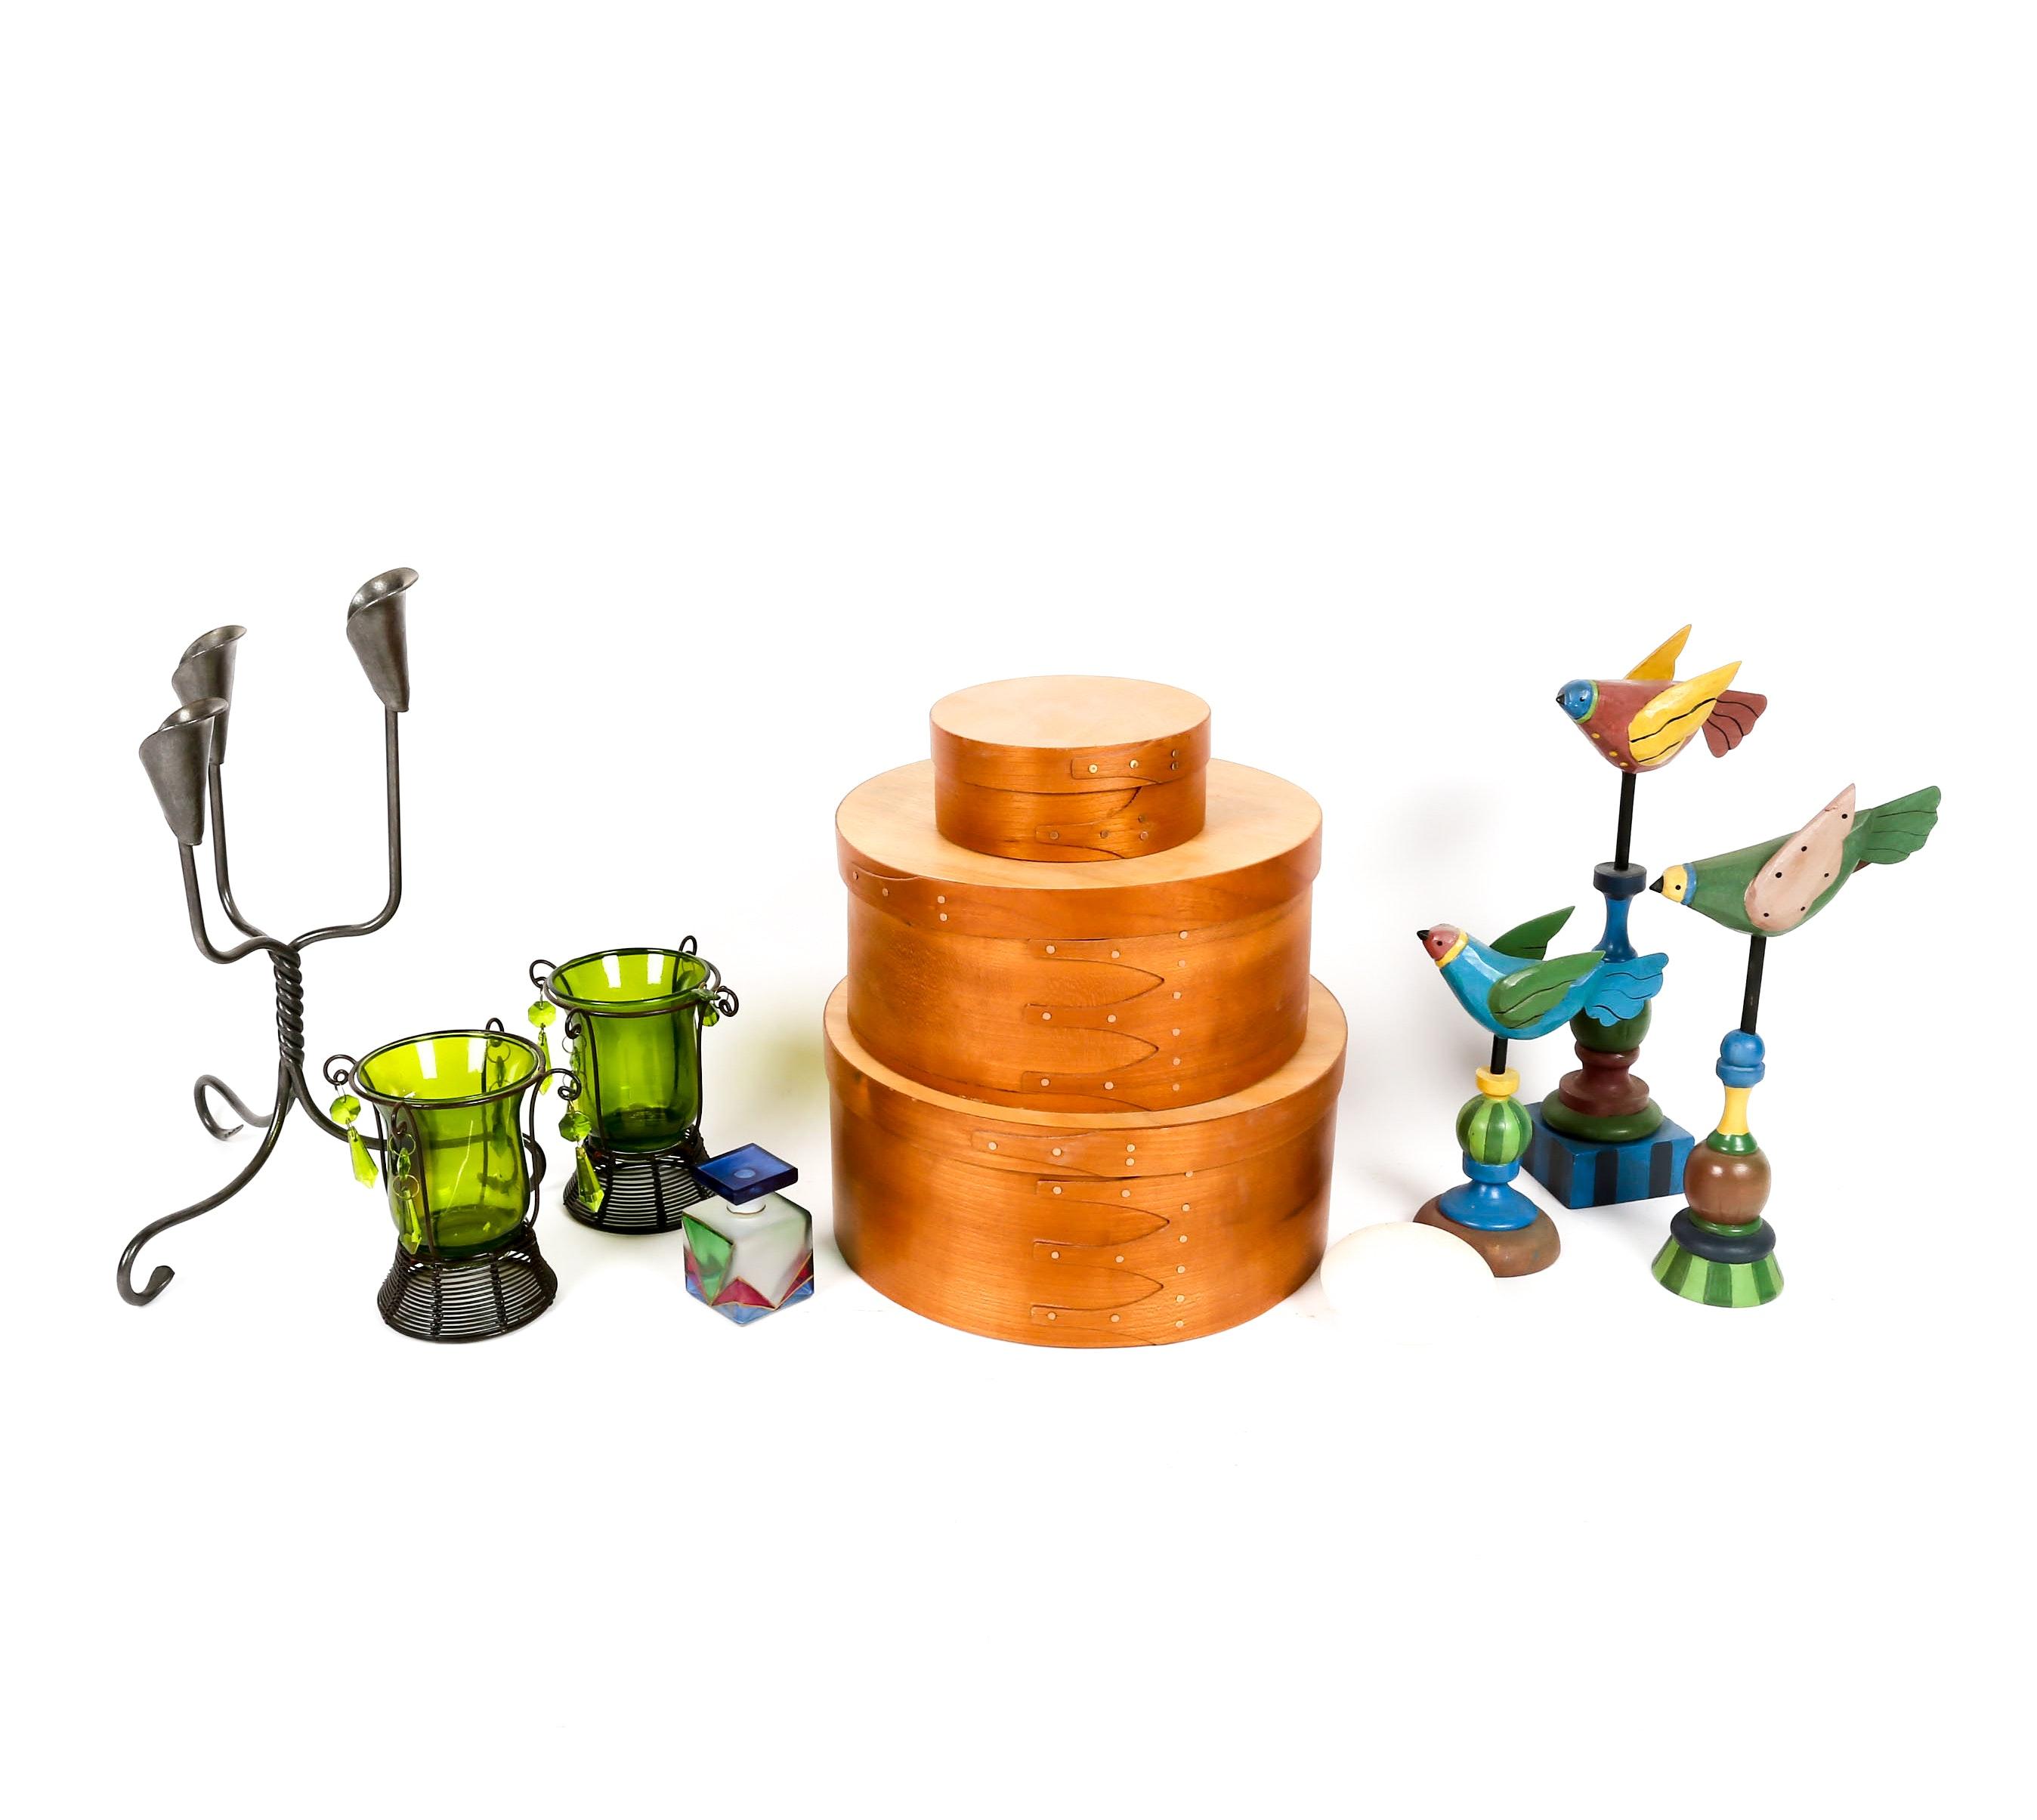 Assortment of Home Decor Items